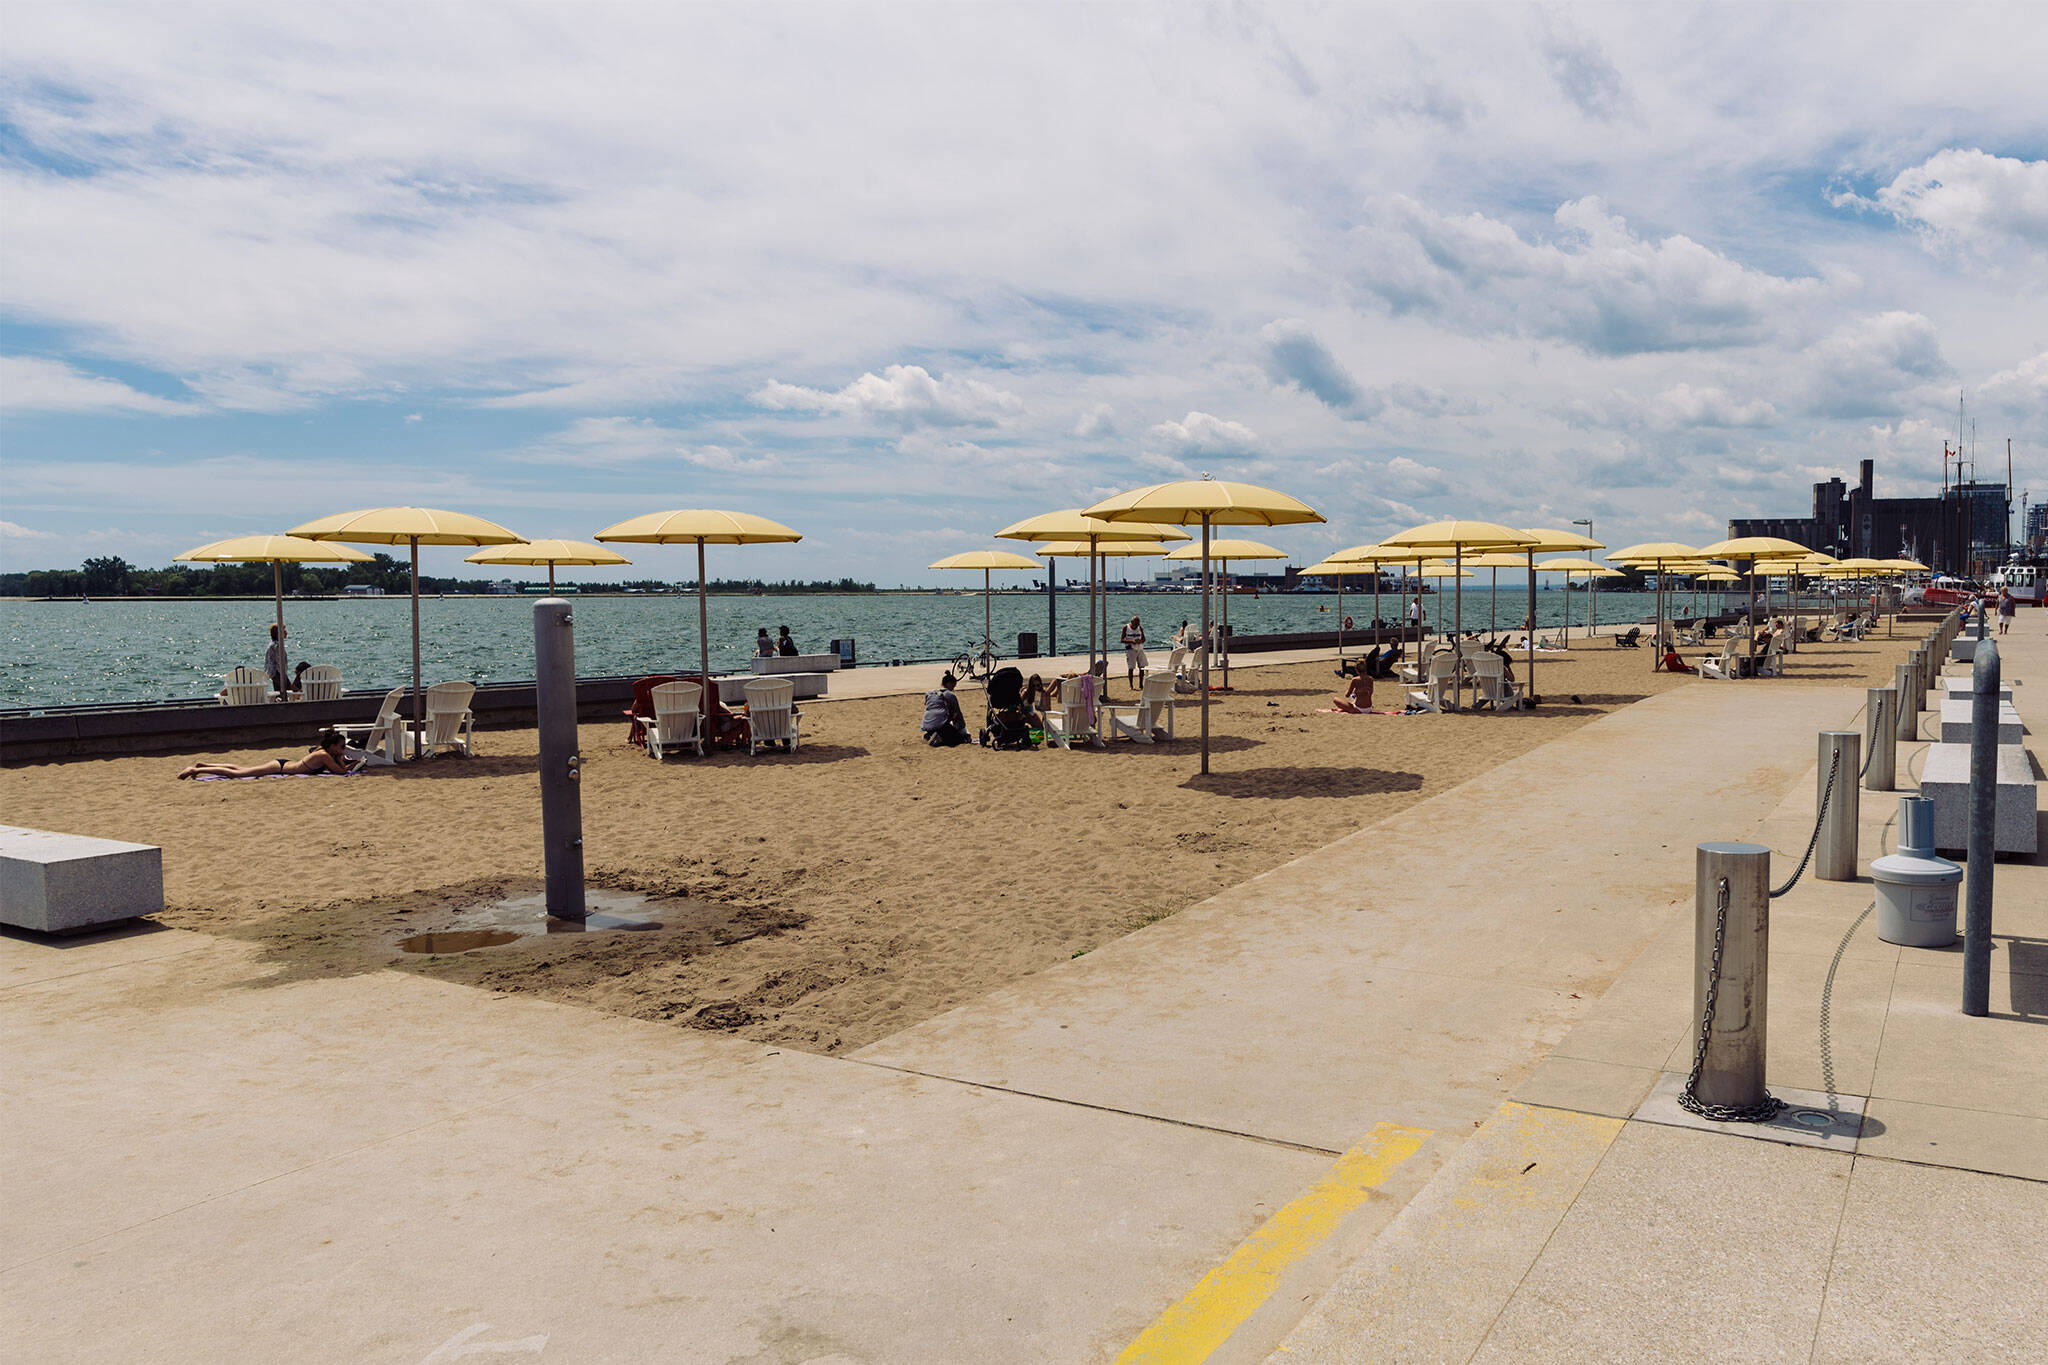 free sunscreen parks toronto